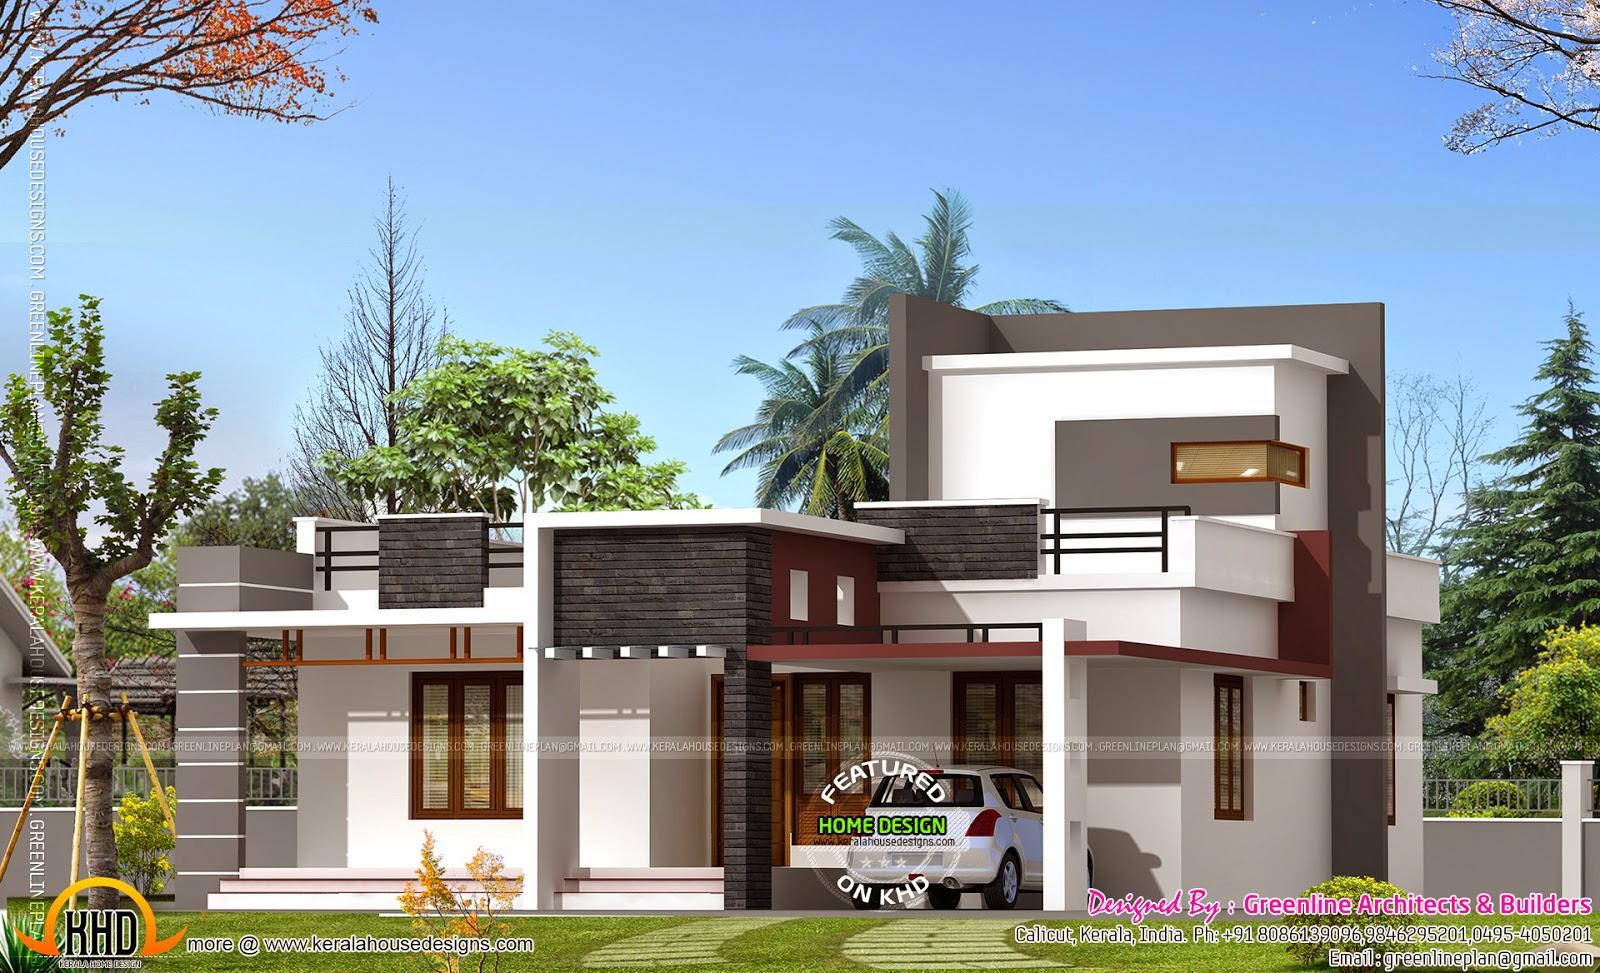 1000 Square Feet House Kerala Home Design Bloglovin'